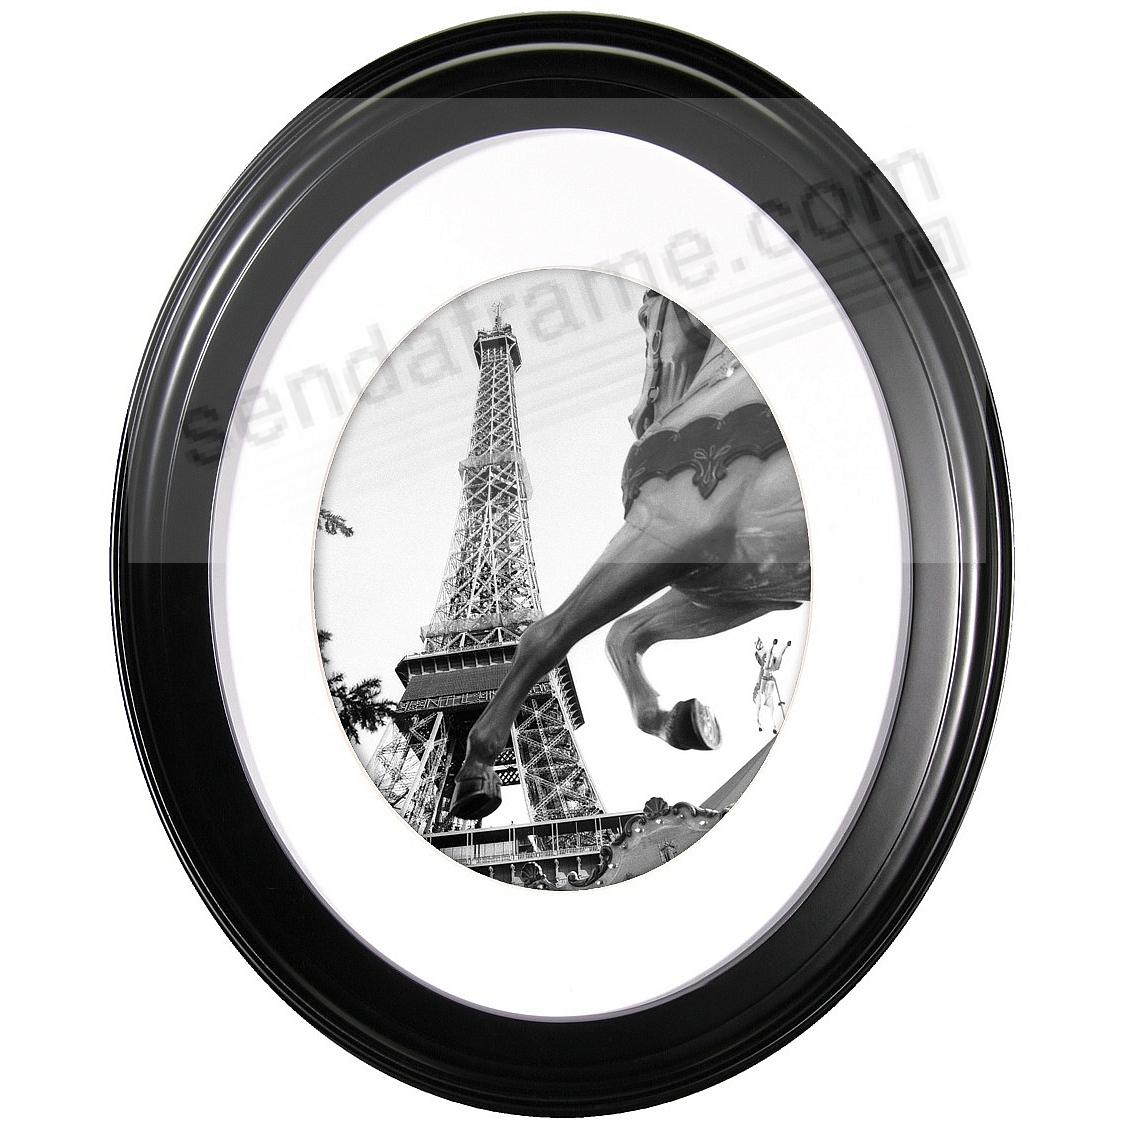 black oval portrait frame 11x14 8x10 by mcs picture frames photo